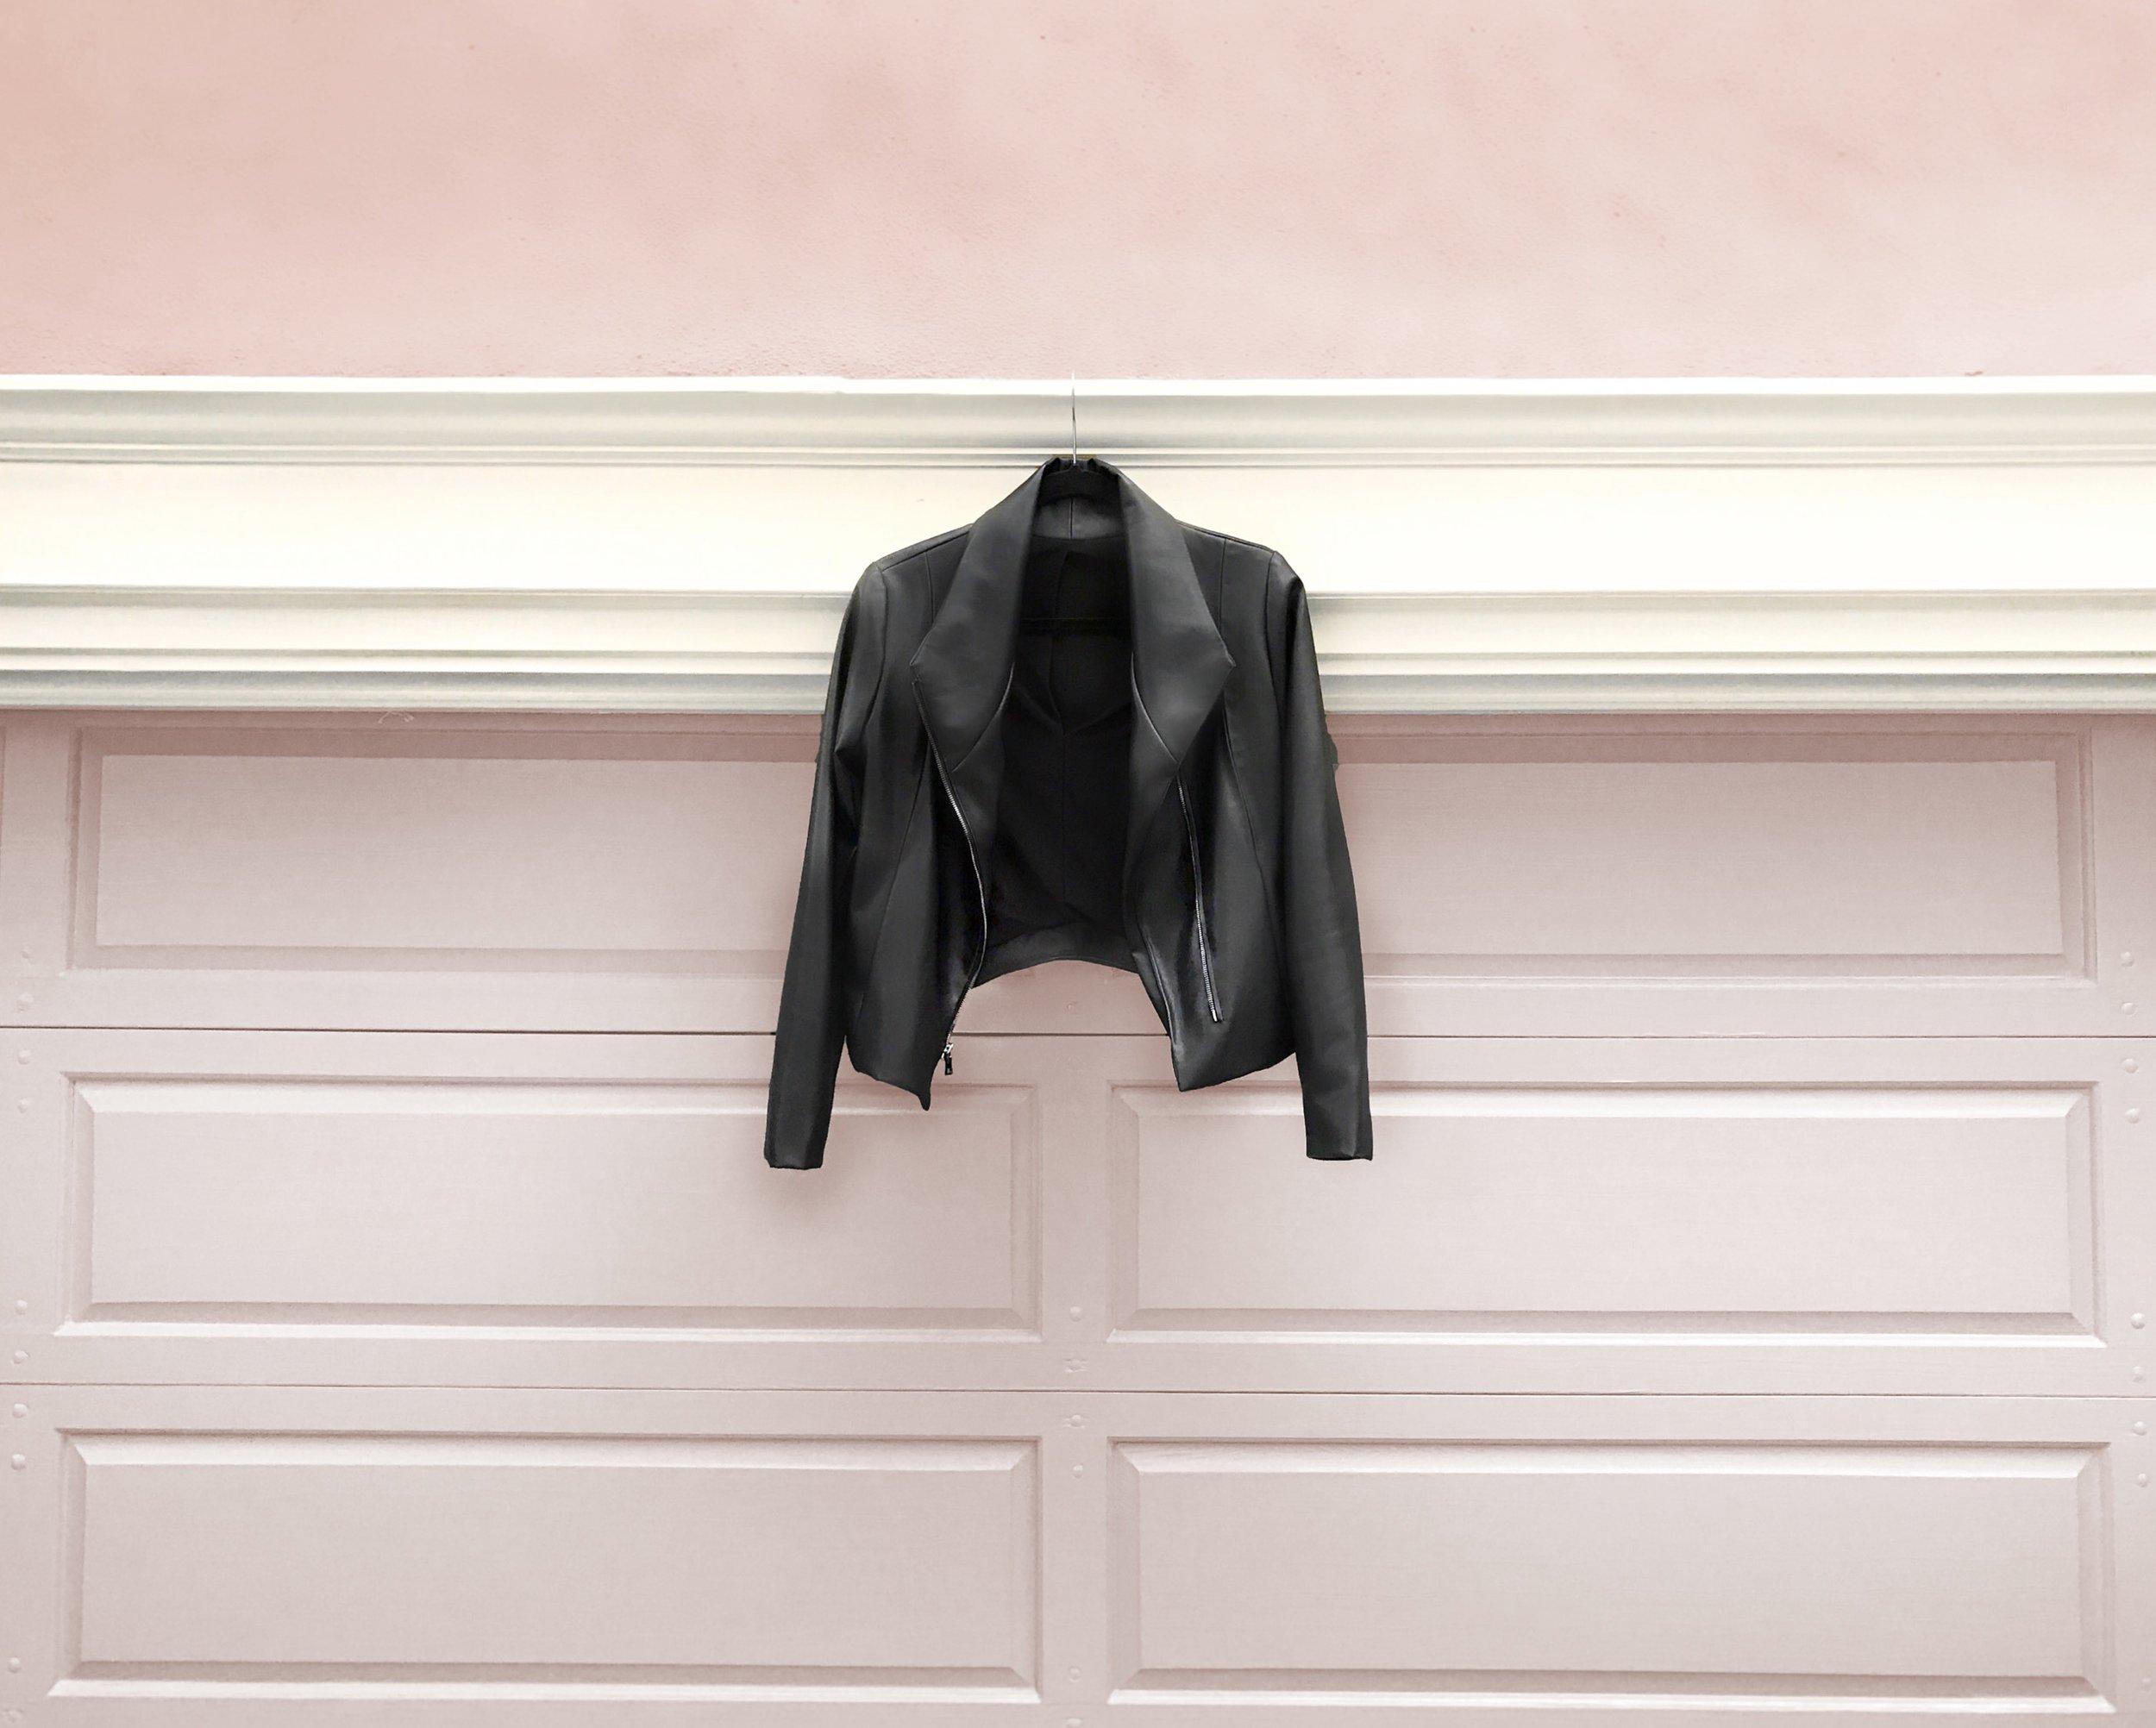 Lifestyle_Jacket Blush Wall_Brevity Brand.JPG